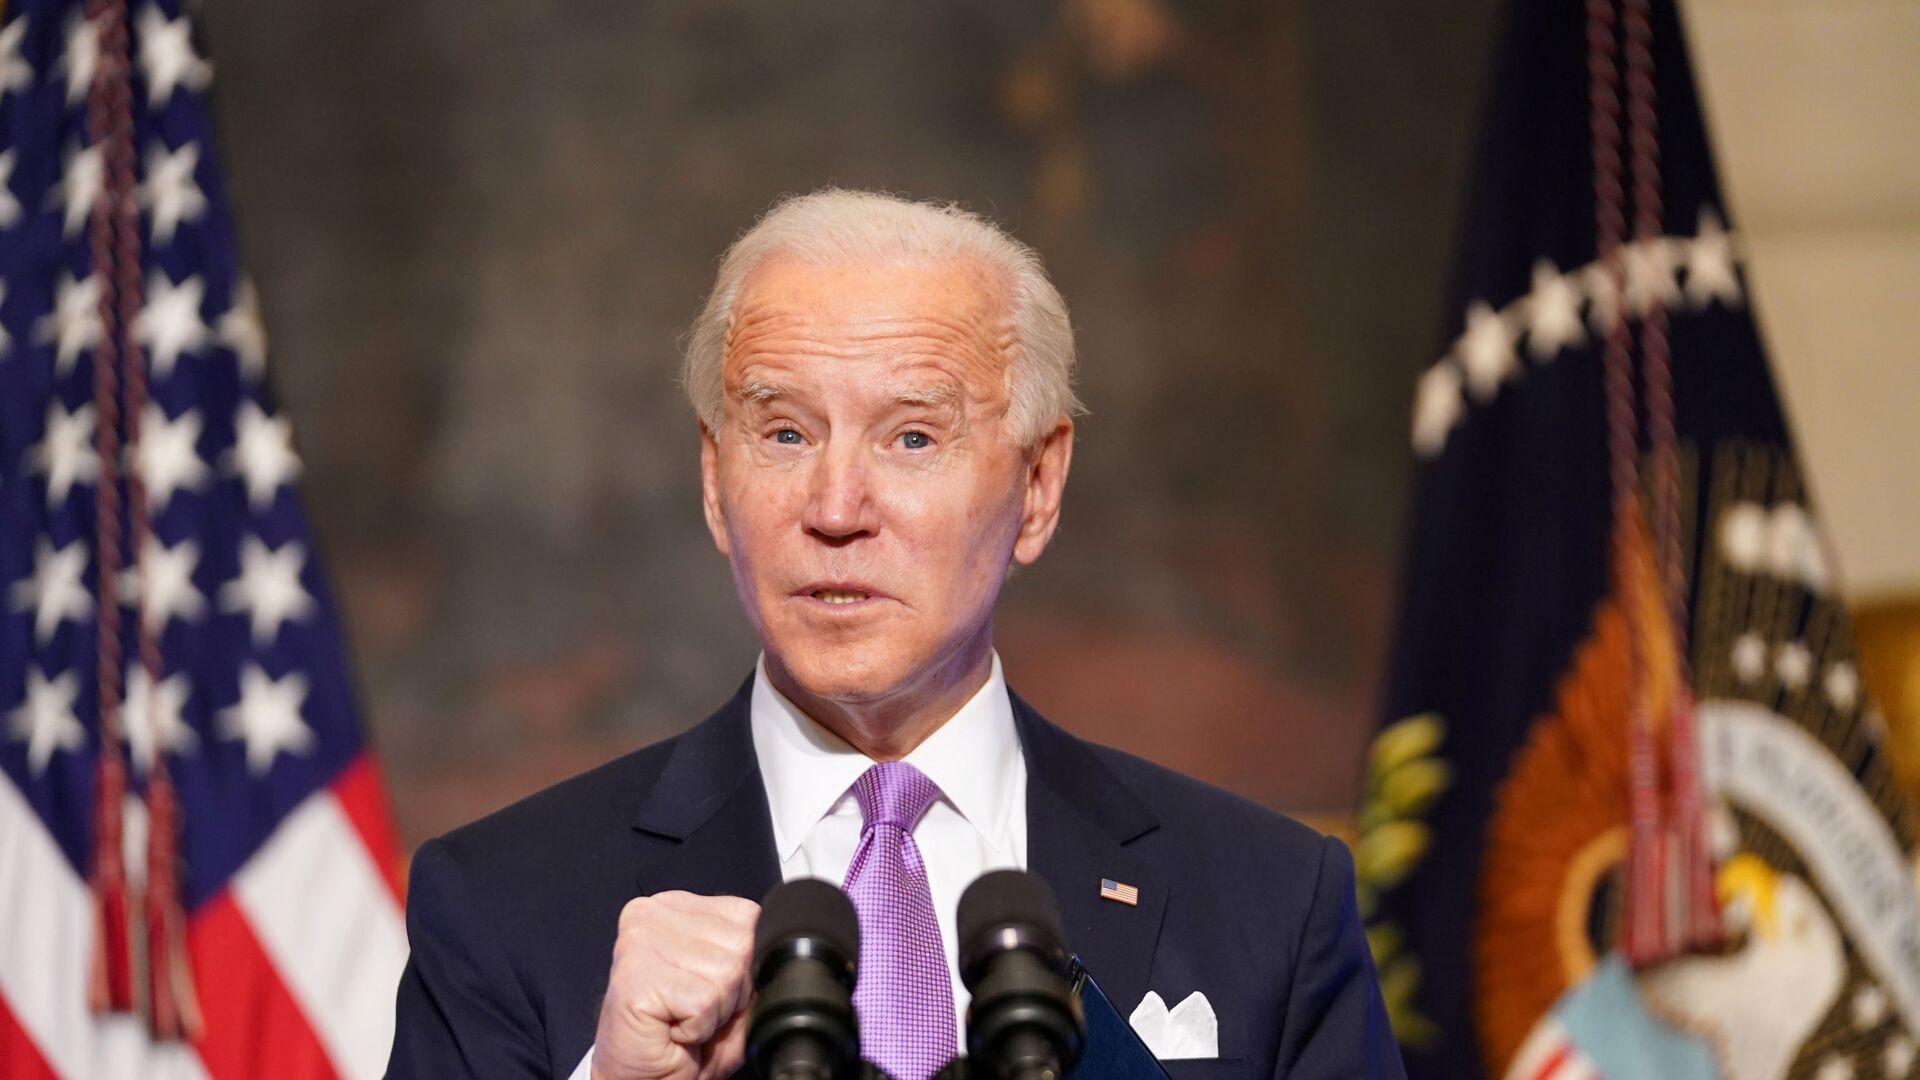 Joe Biden, presidente de EEUU - Sputnik Mundo, 1920, 10.02.2021